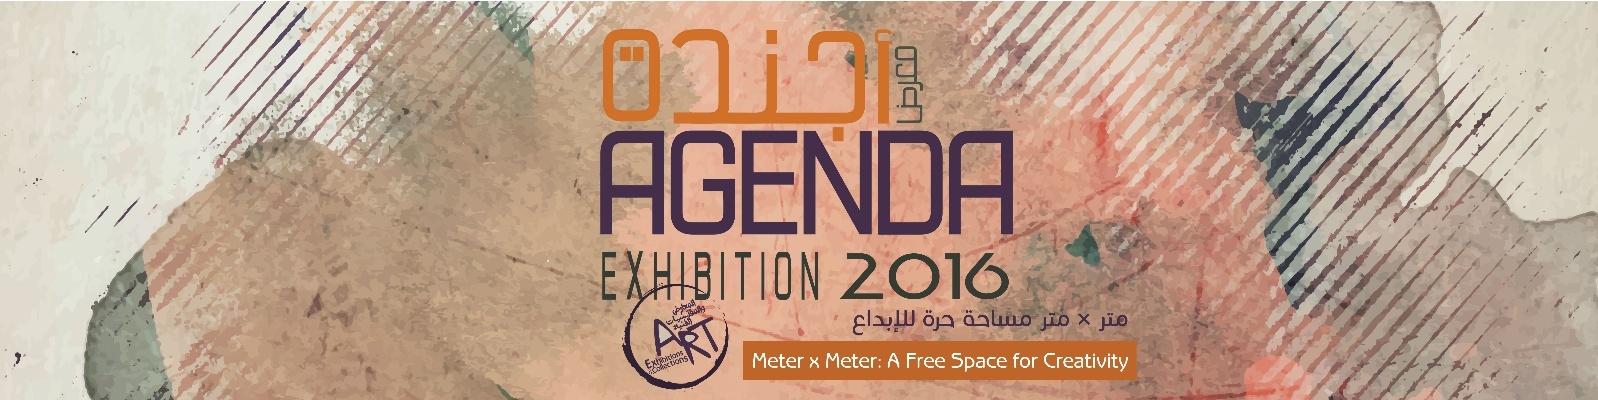 Agenda Exhibition